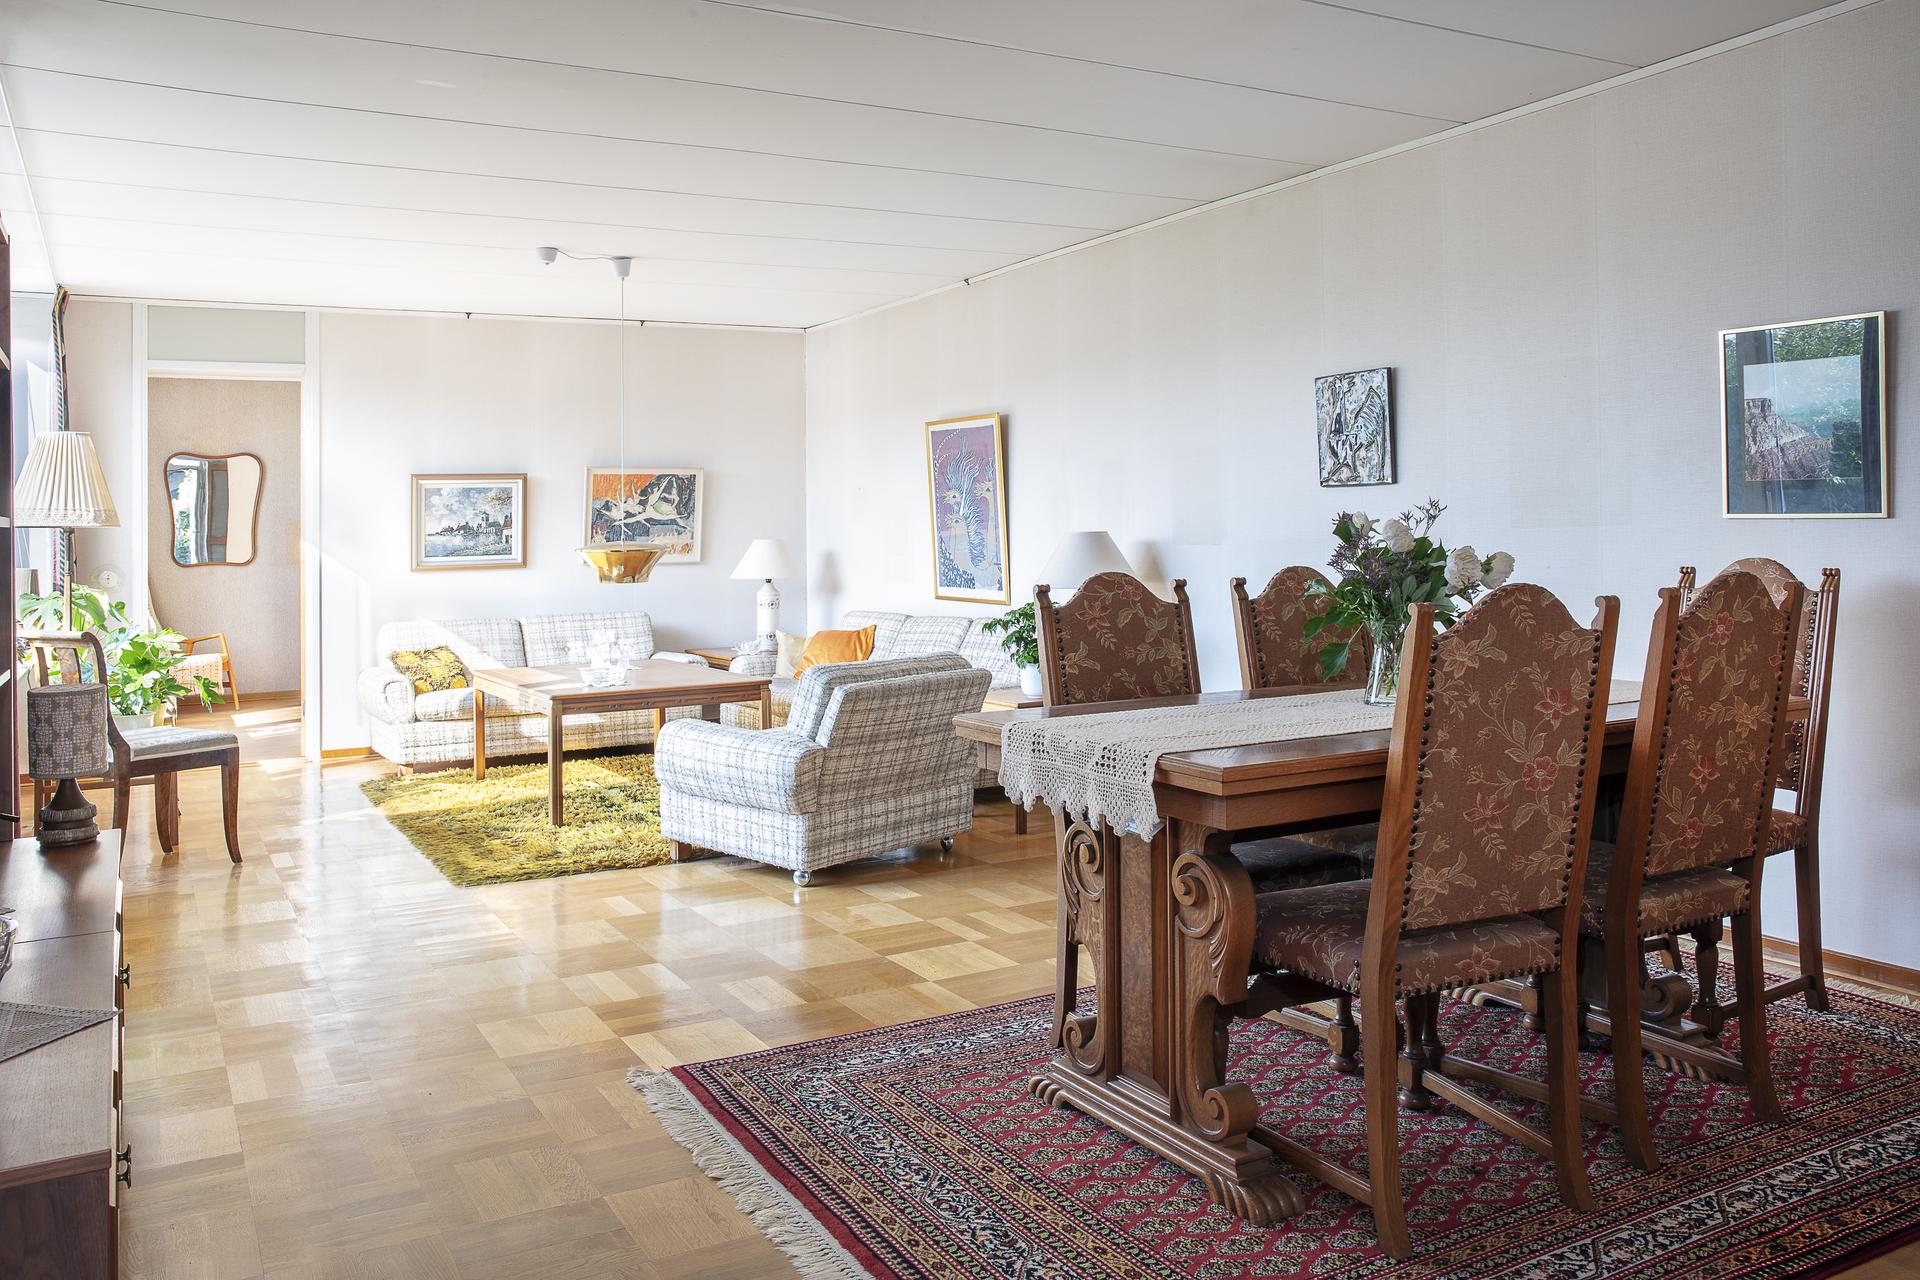 Generöst vardagsrum med lamellparkett på golvet